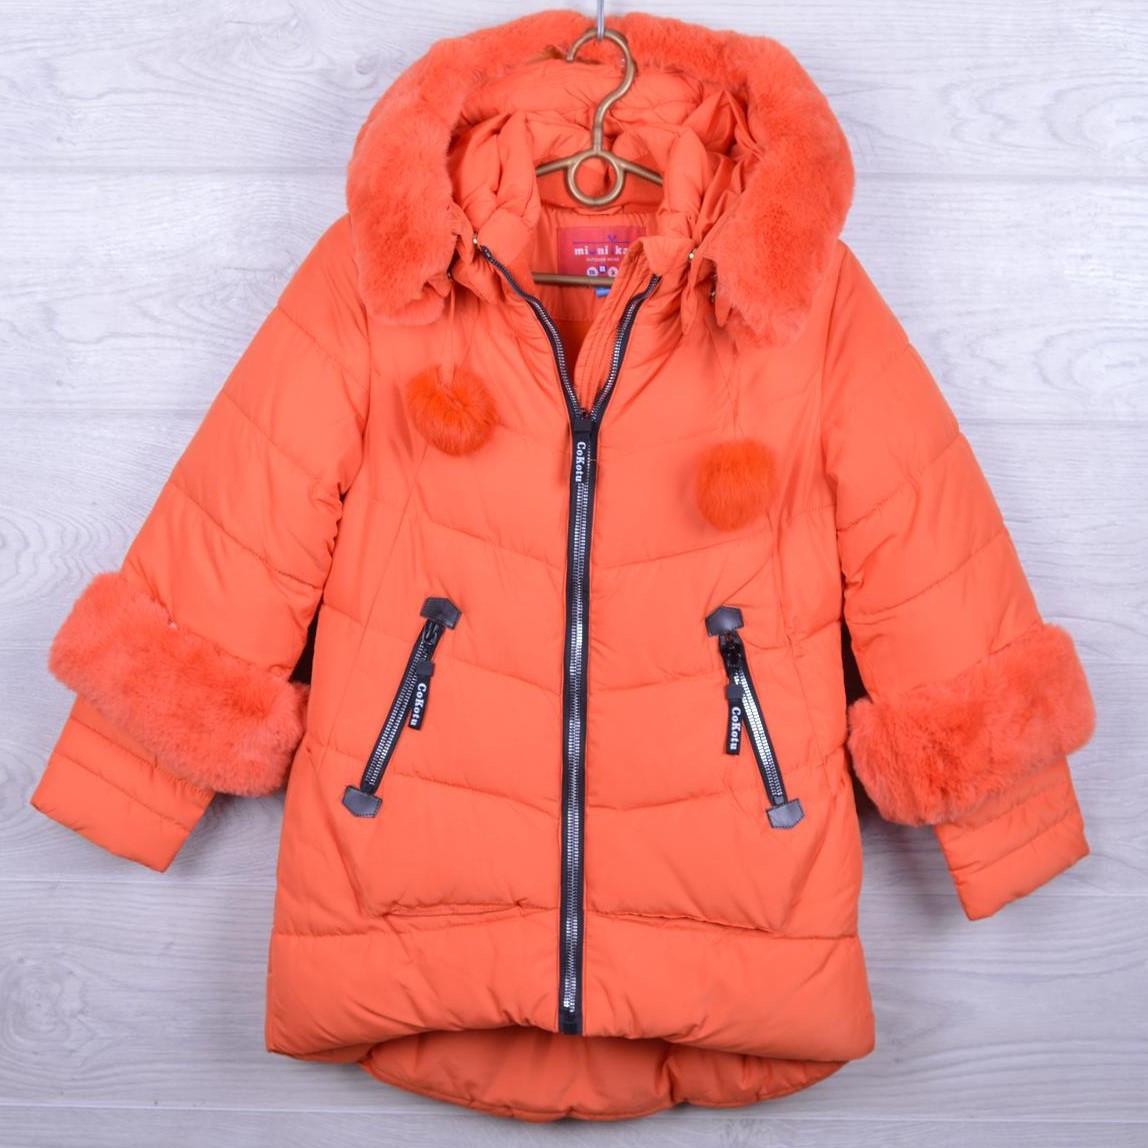 36a54b9faf1 Куртка подростковая зимняя